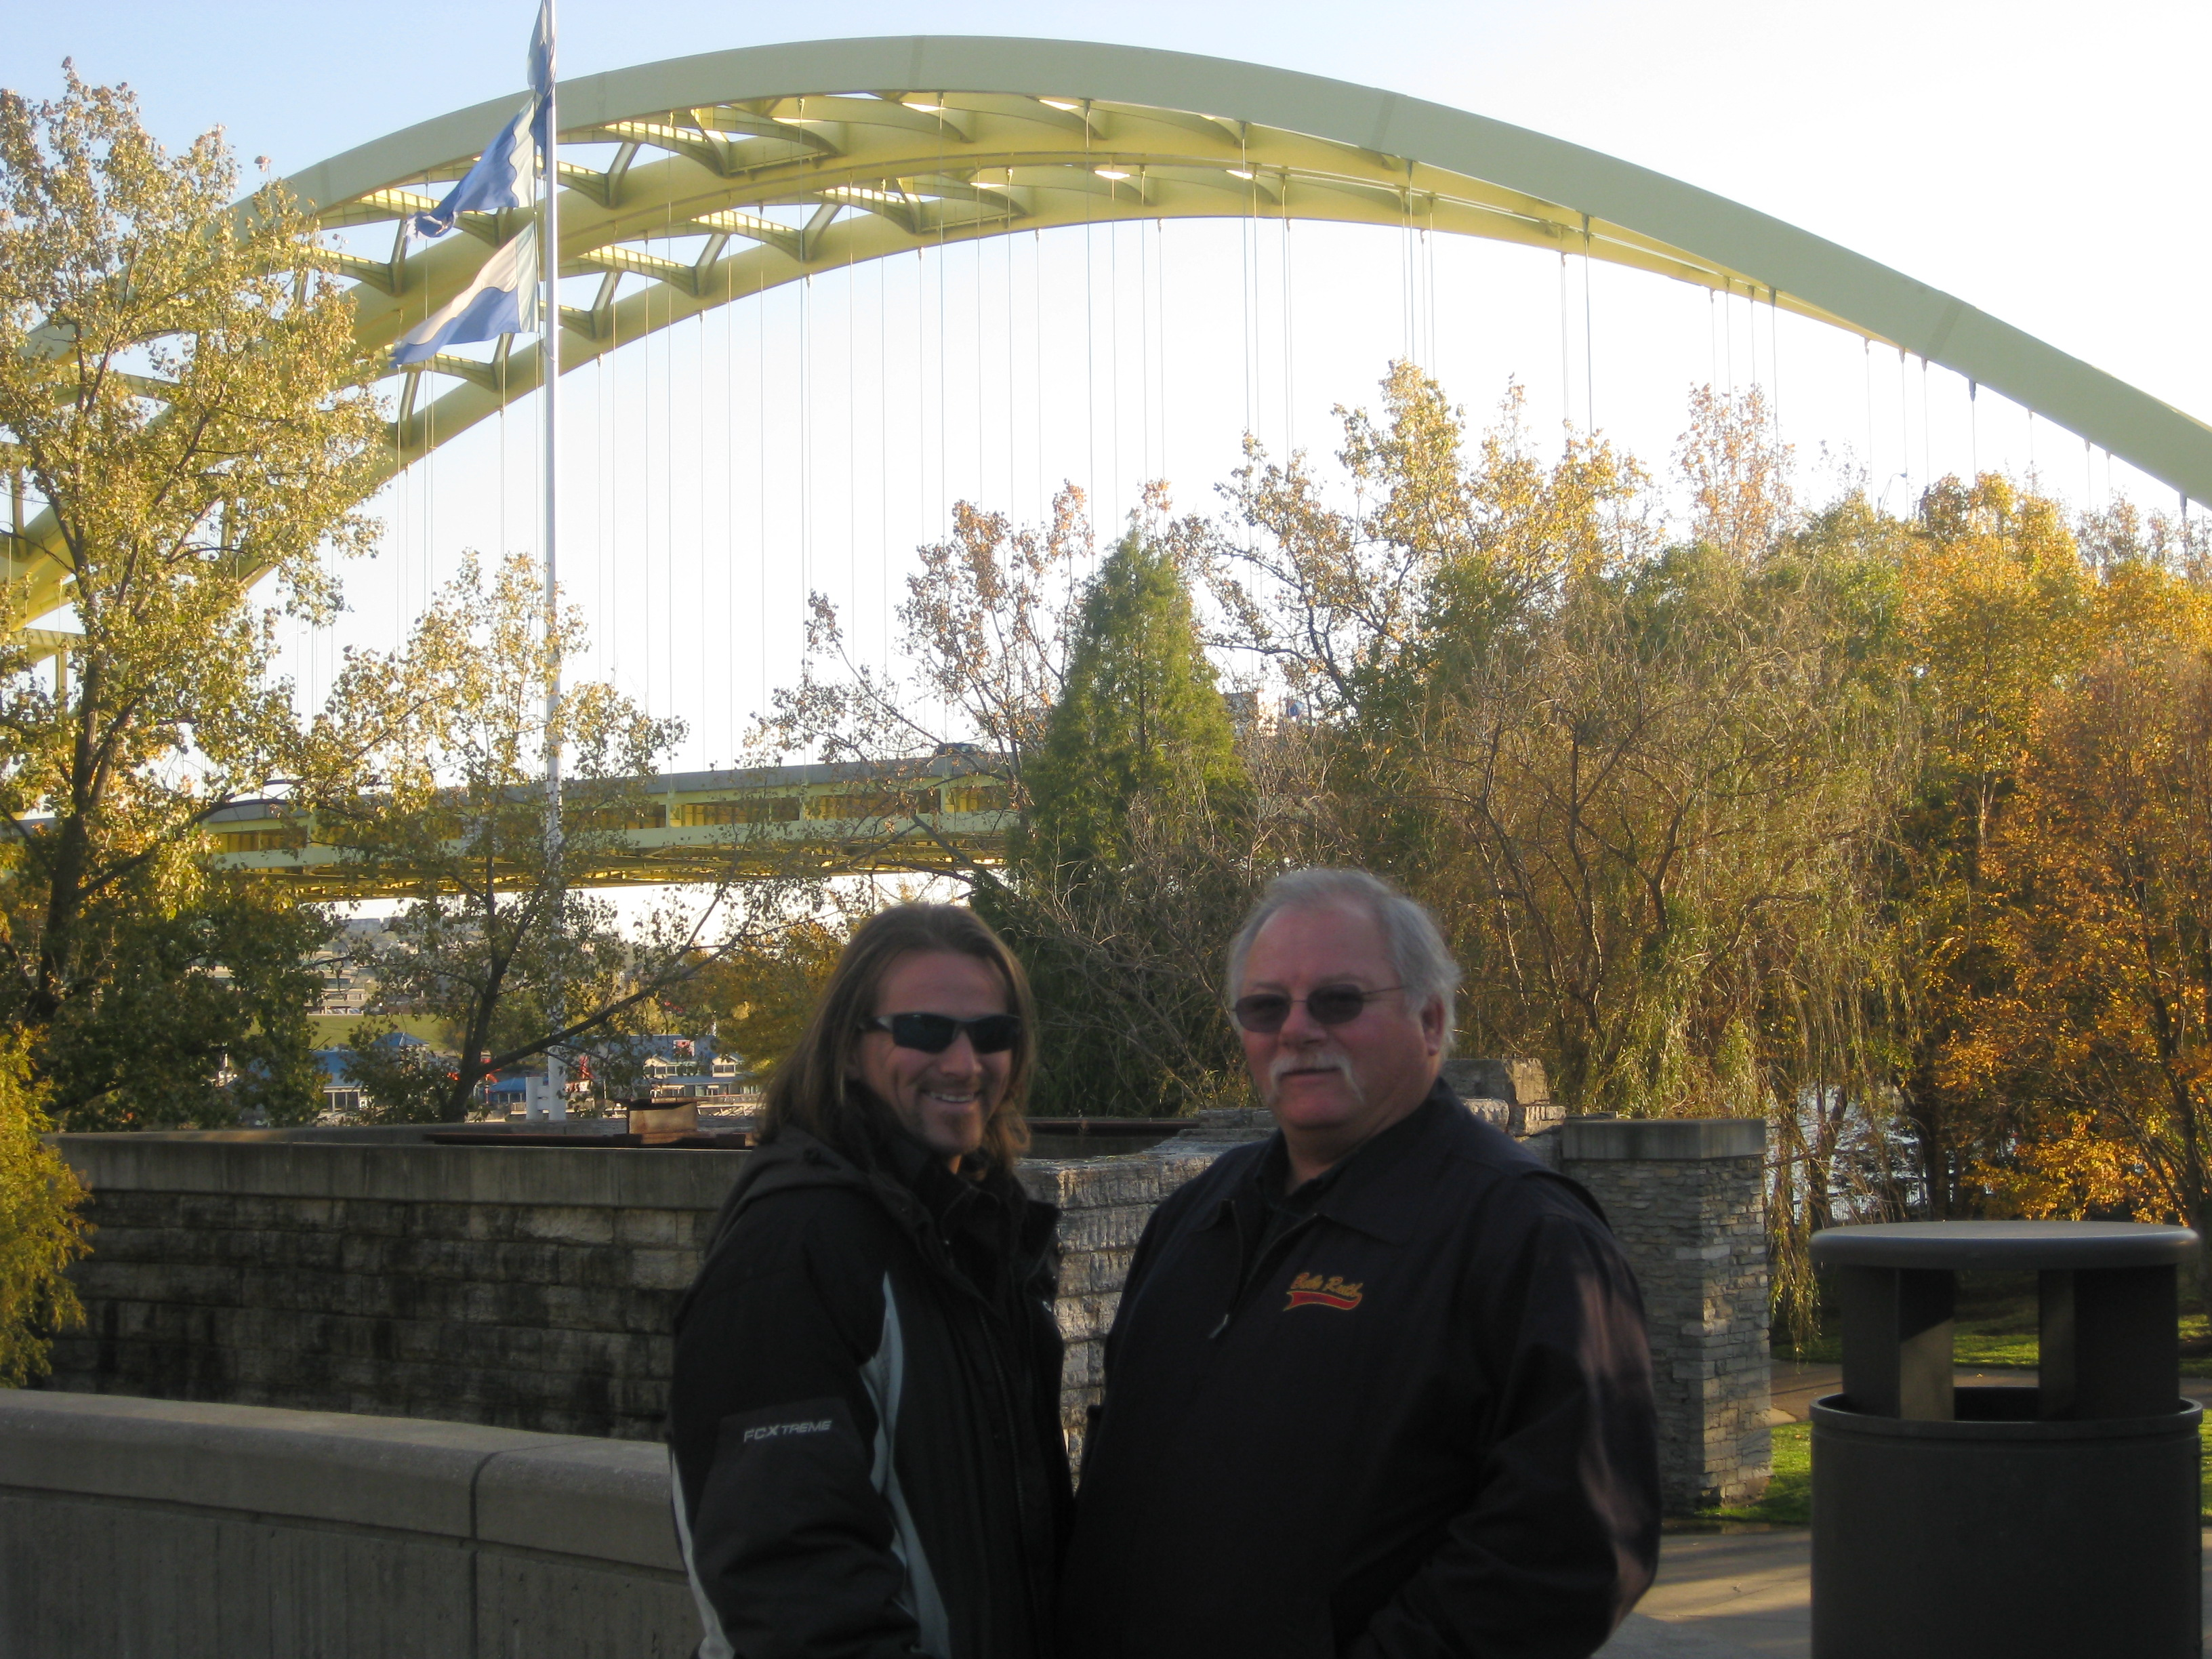 My Father David Hargrove and I